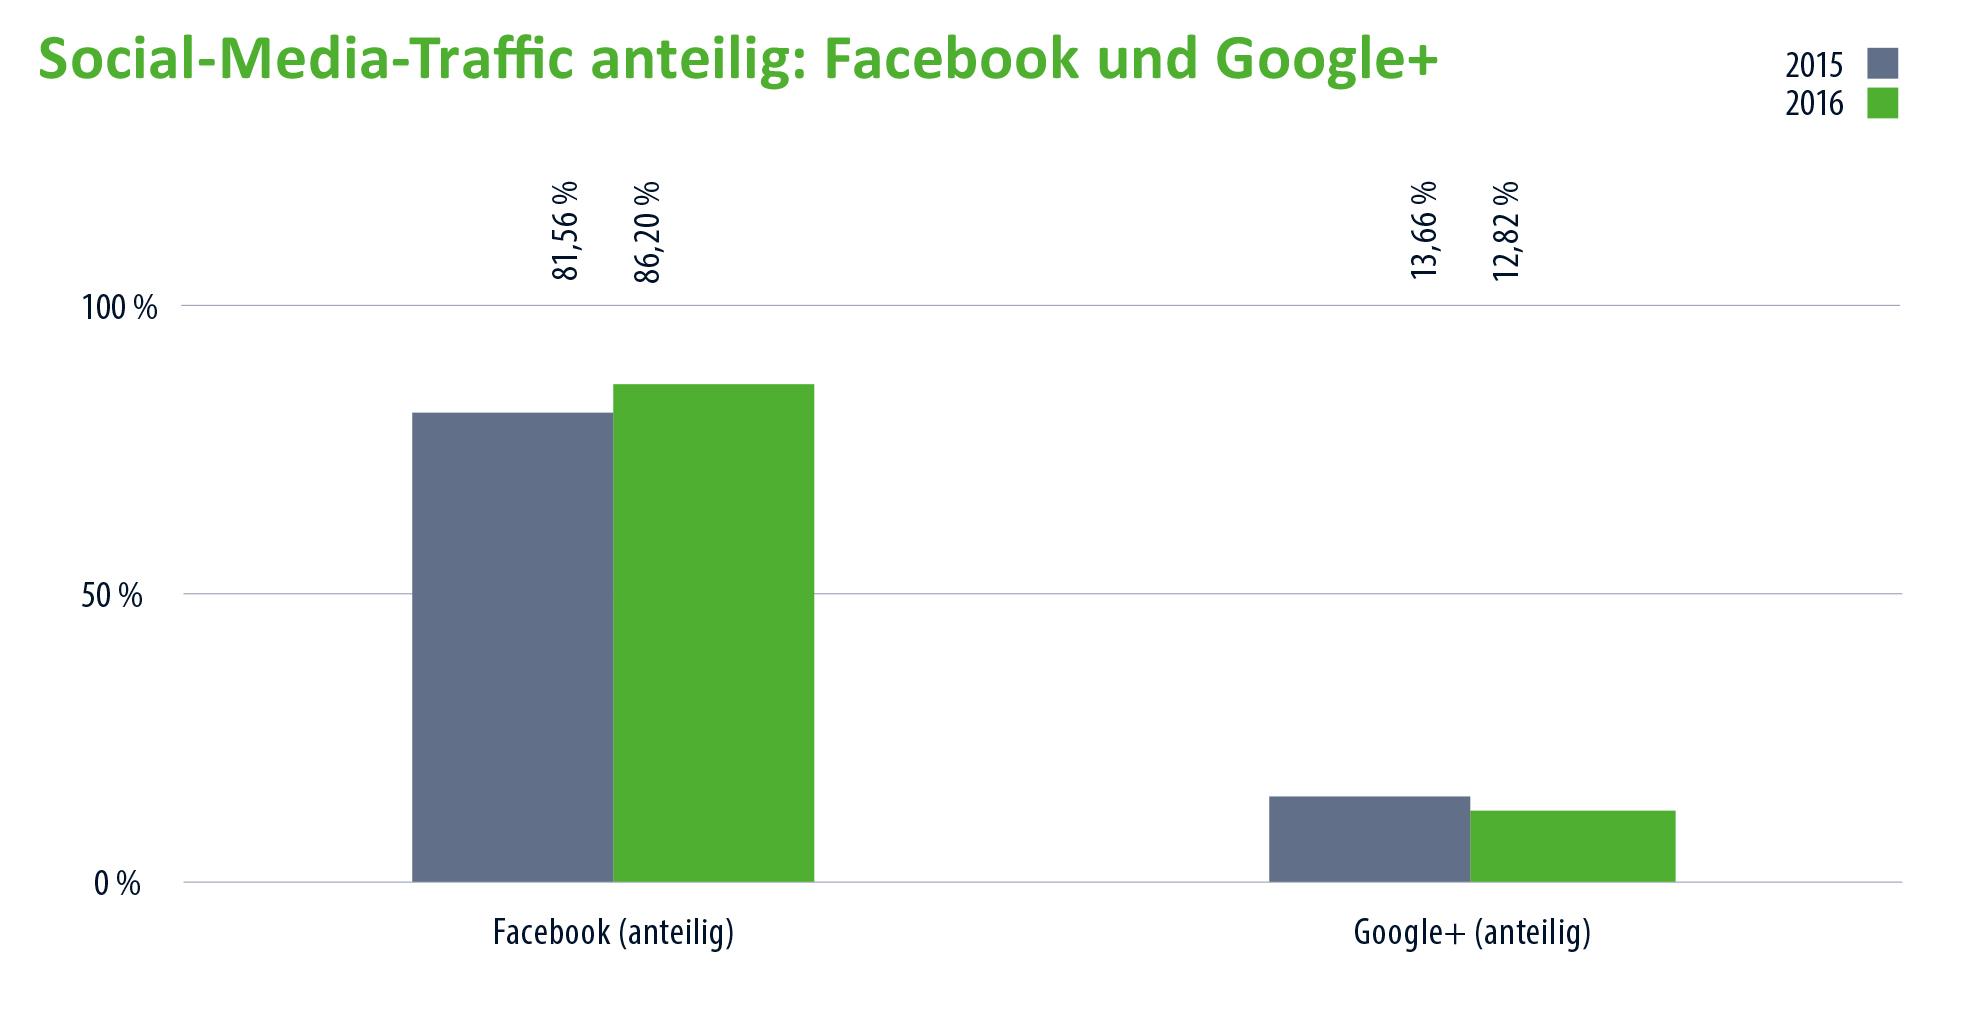 vergleich_social_media_traffic_anteilig